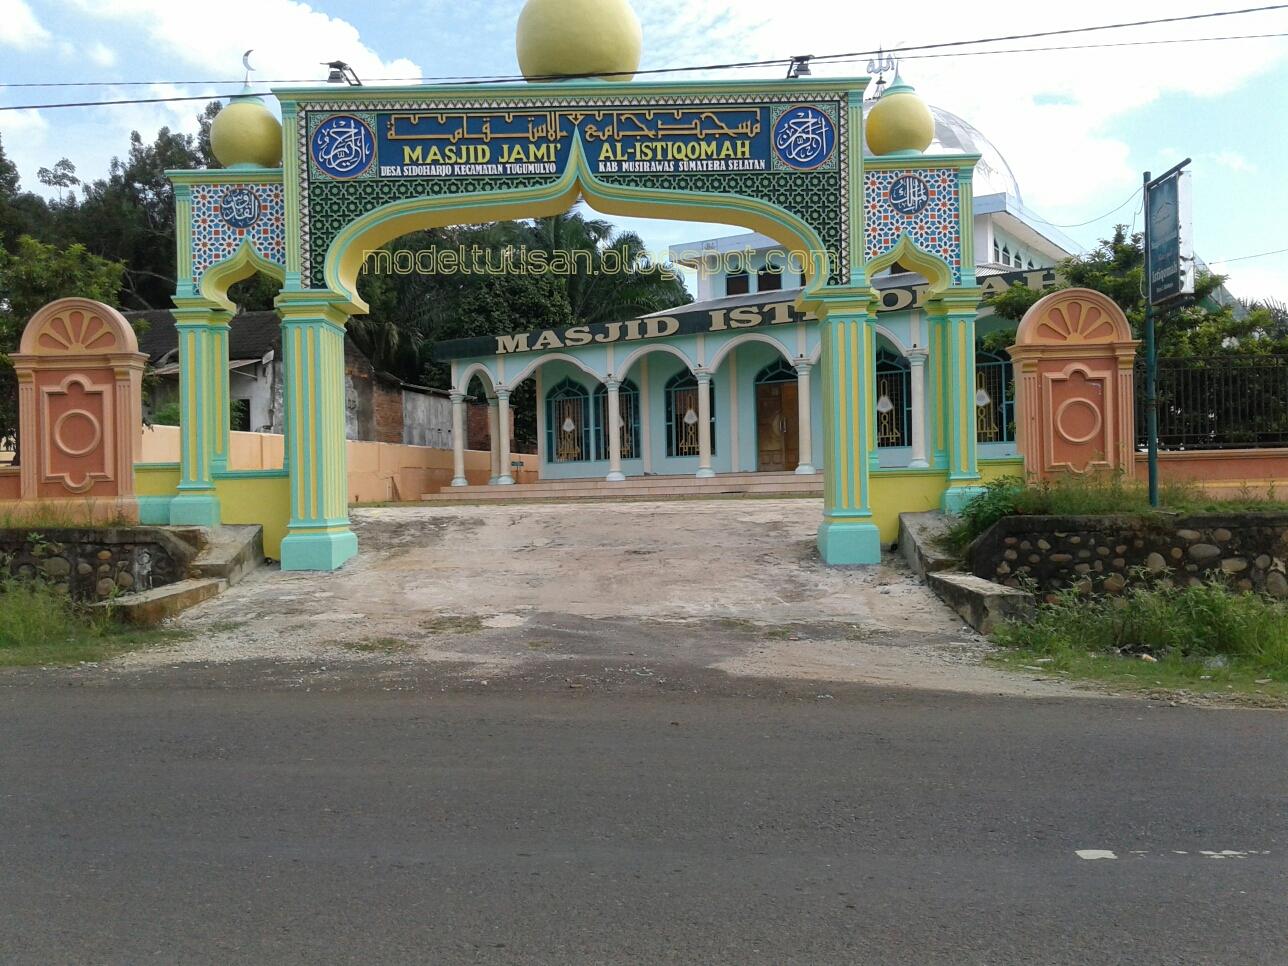 Model Tulisan Contoh Kaligrafi Hiasan Gerbang Masjid Agung